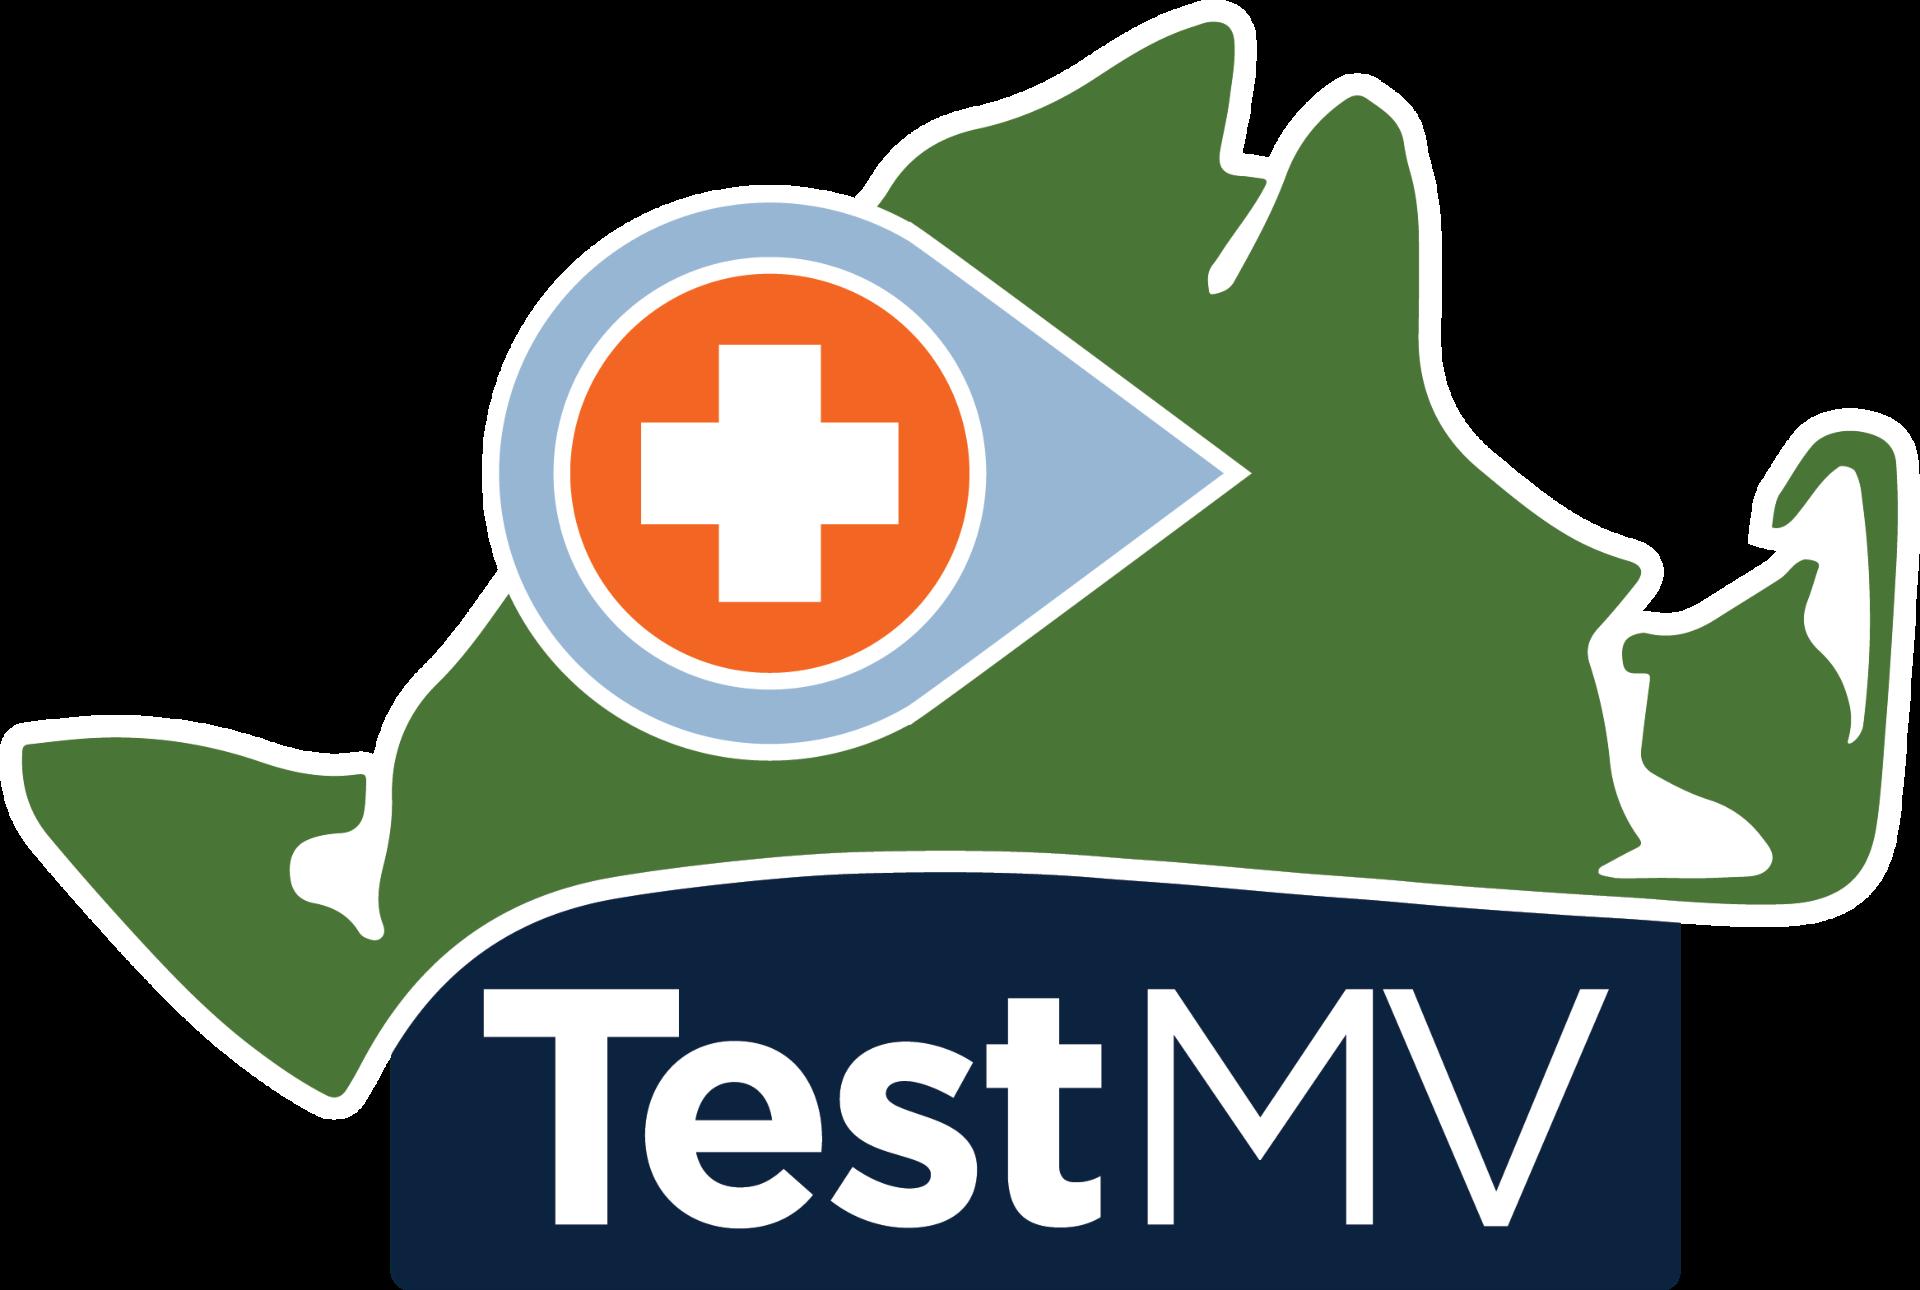 test-mv-badge-2